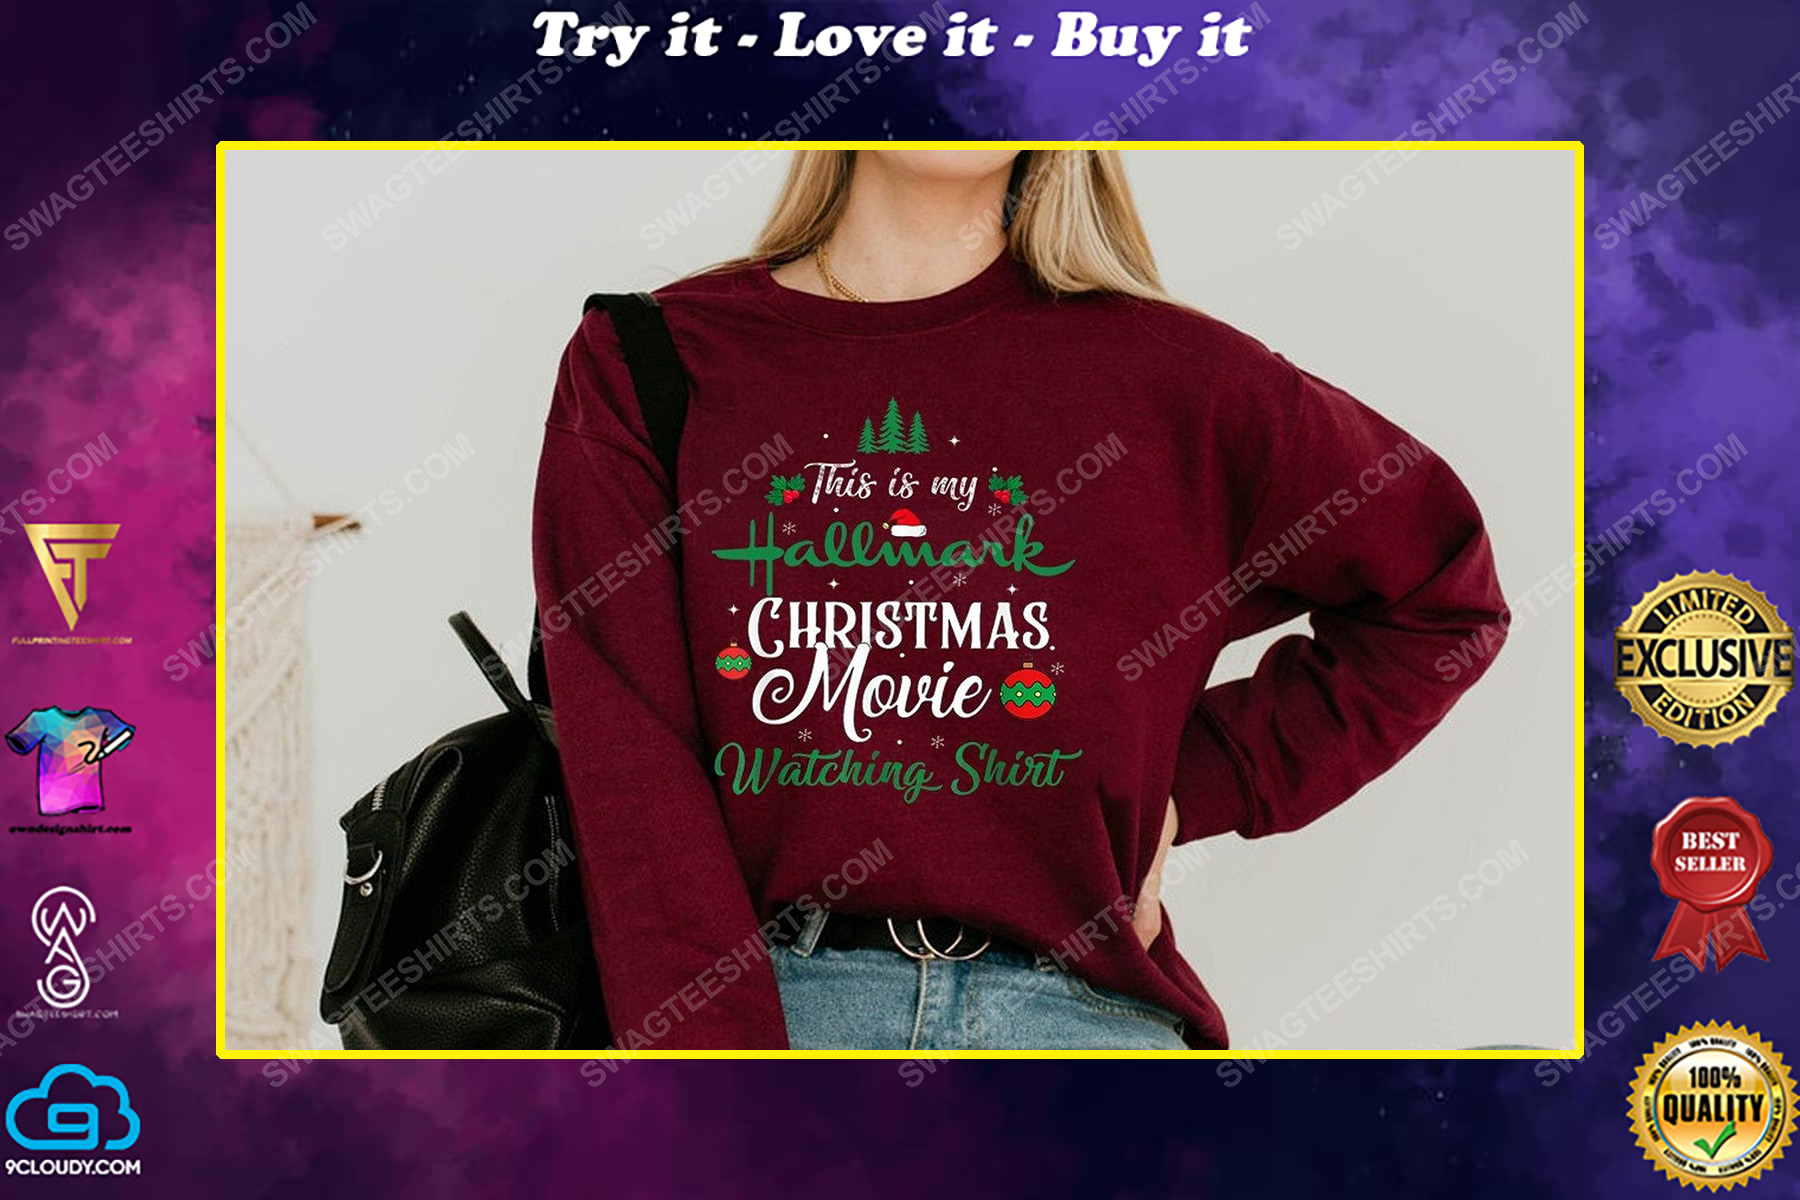 Merry christmas this is my hallmark christmas movie watching shirt